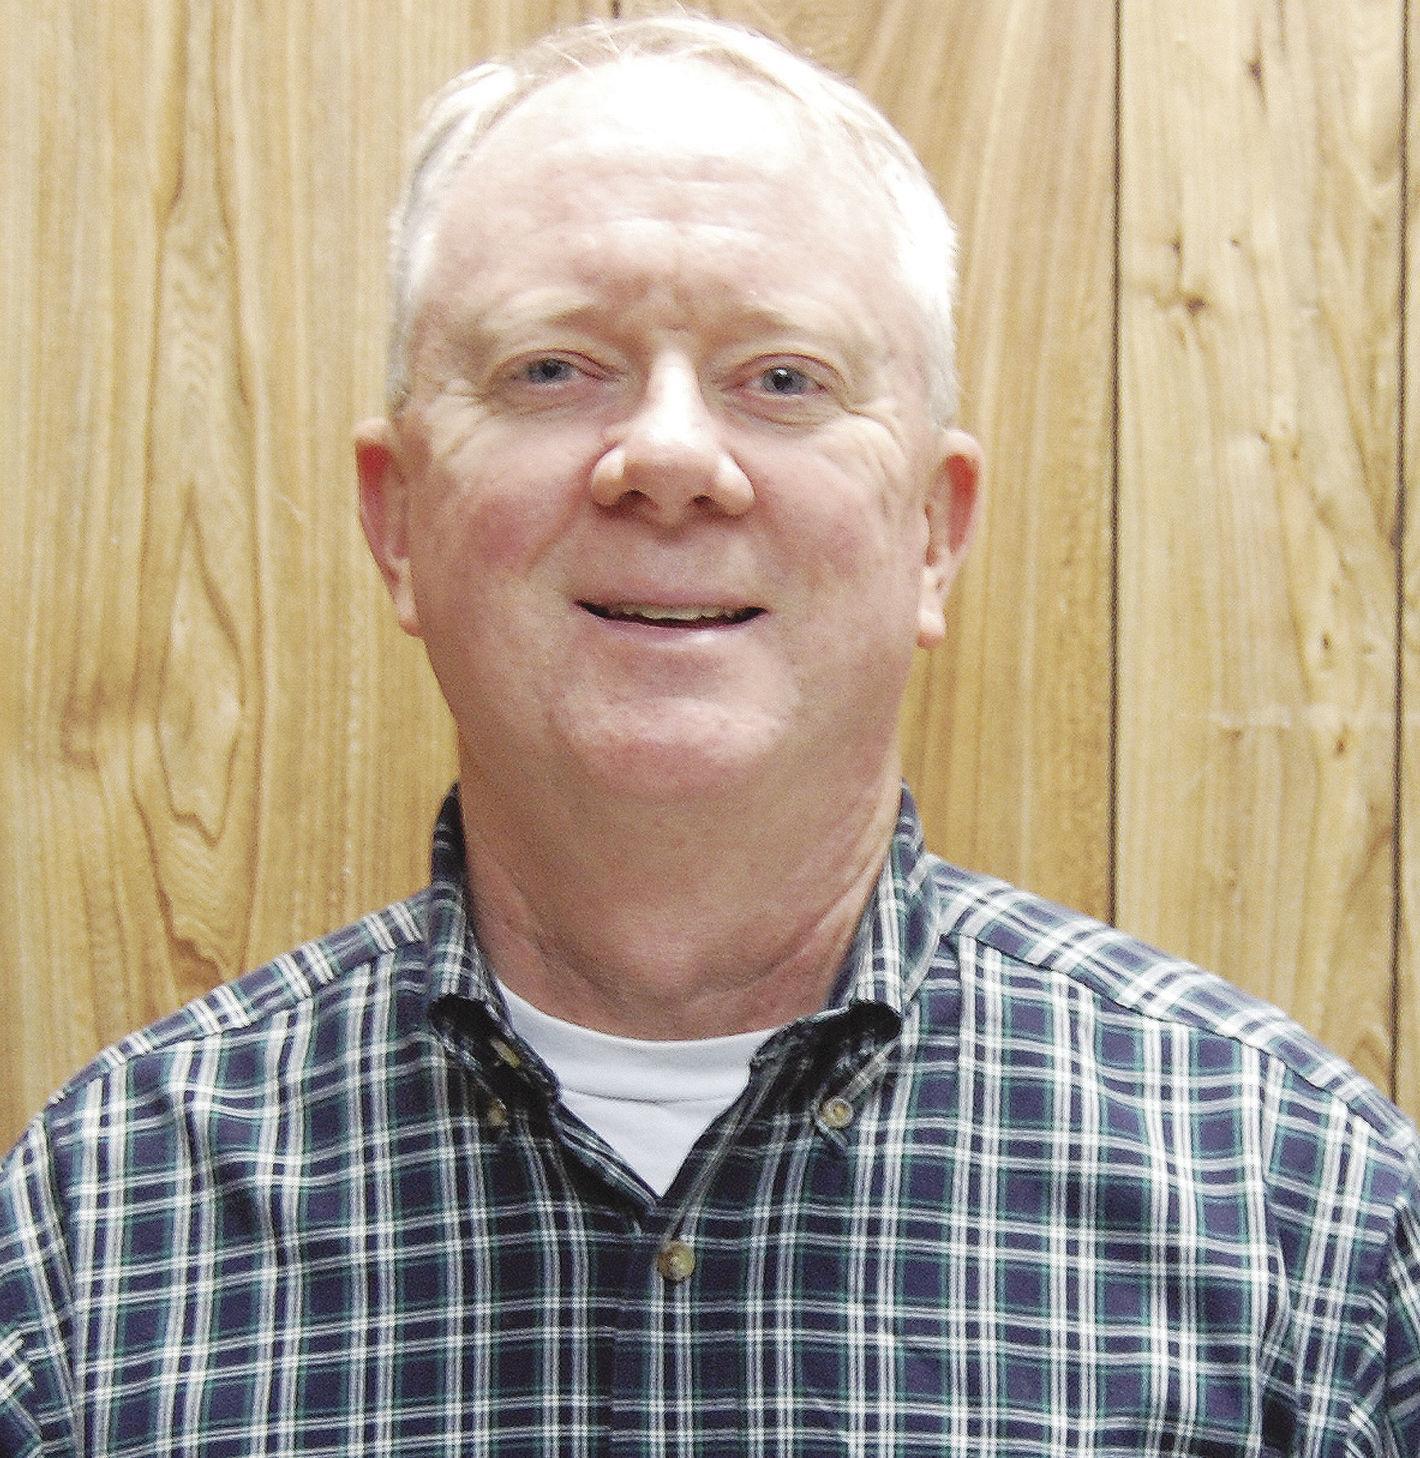 Harrill seeks County Commission seat